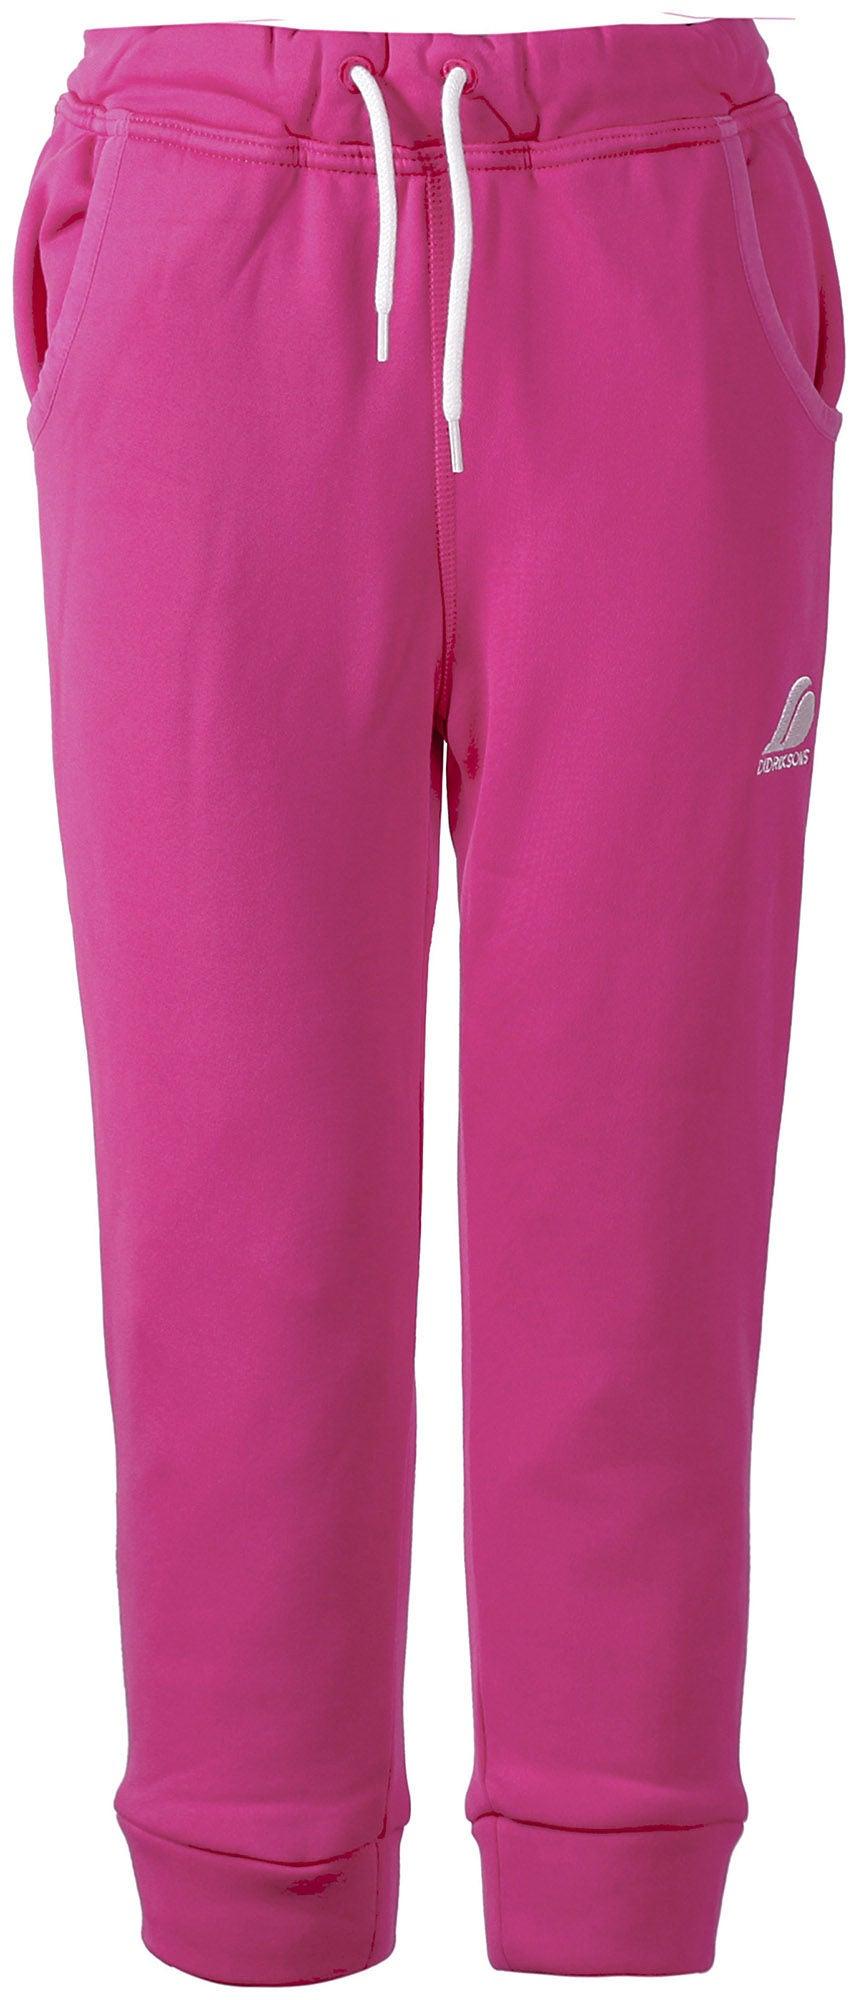 Didriksons Corin Powerstretch Byxa Plastic Pink 110